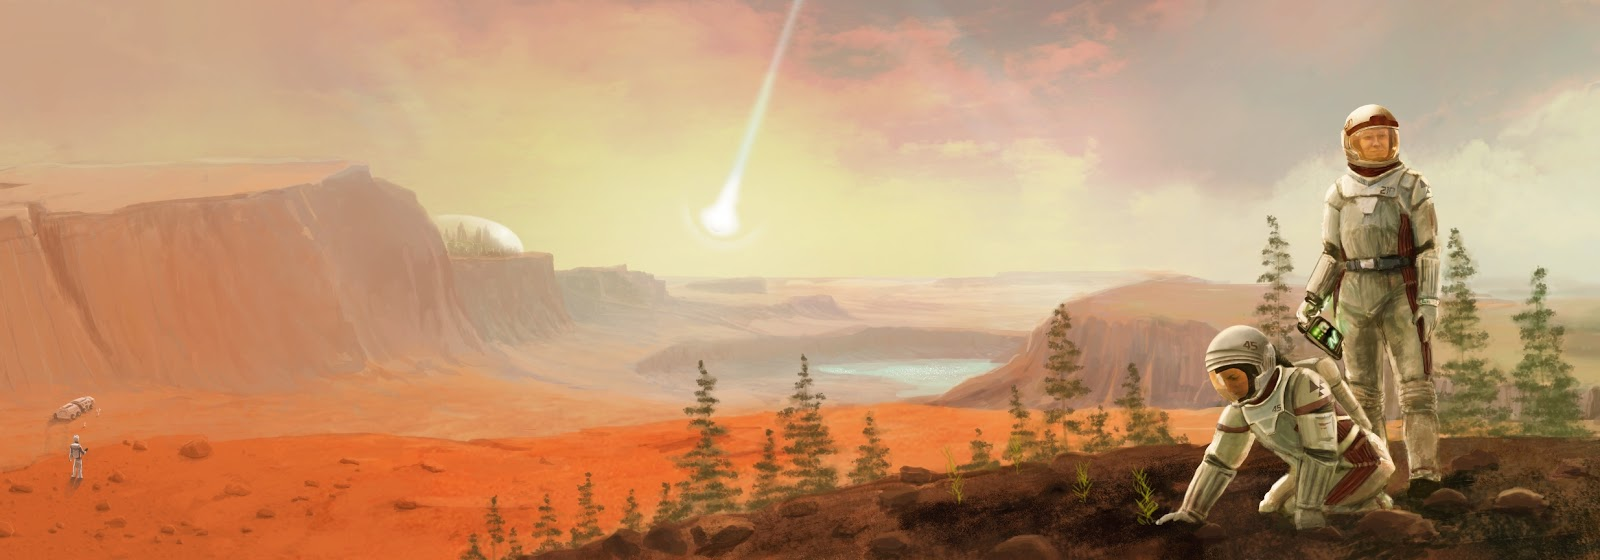 Terraforming Mars by Jacob, Daniel & Isaac Fryxelius (FryxGames)